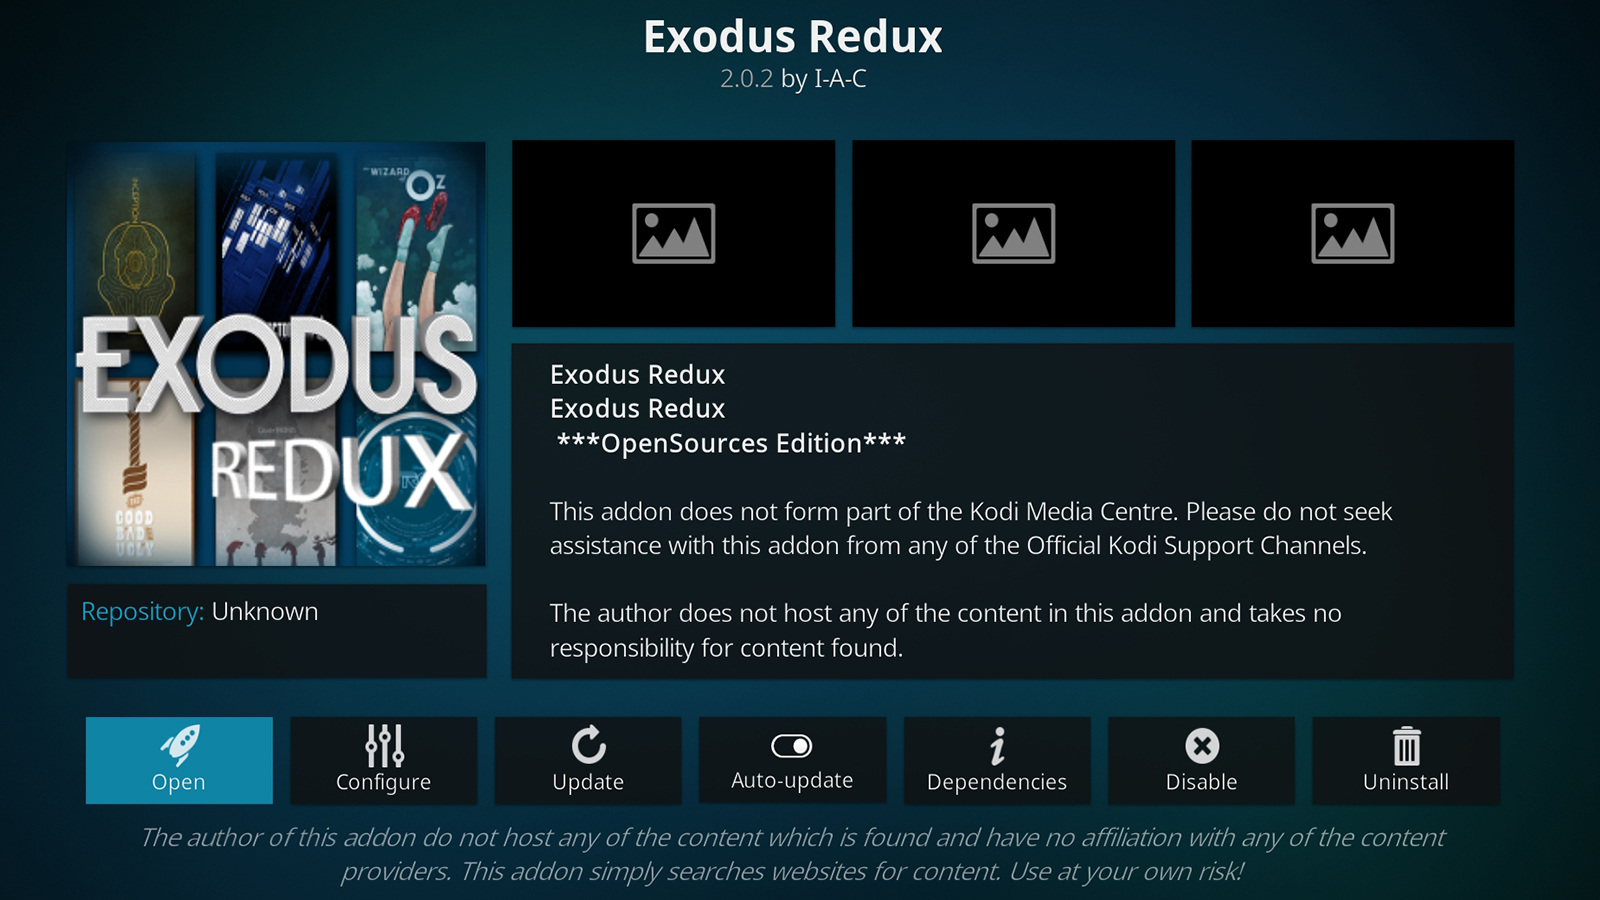 9 Steps to Install Exodus Redux on Kodi in 2019 - TechNadu